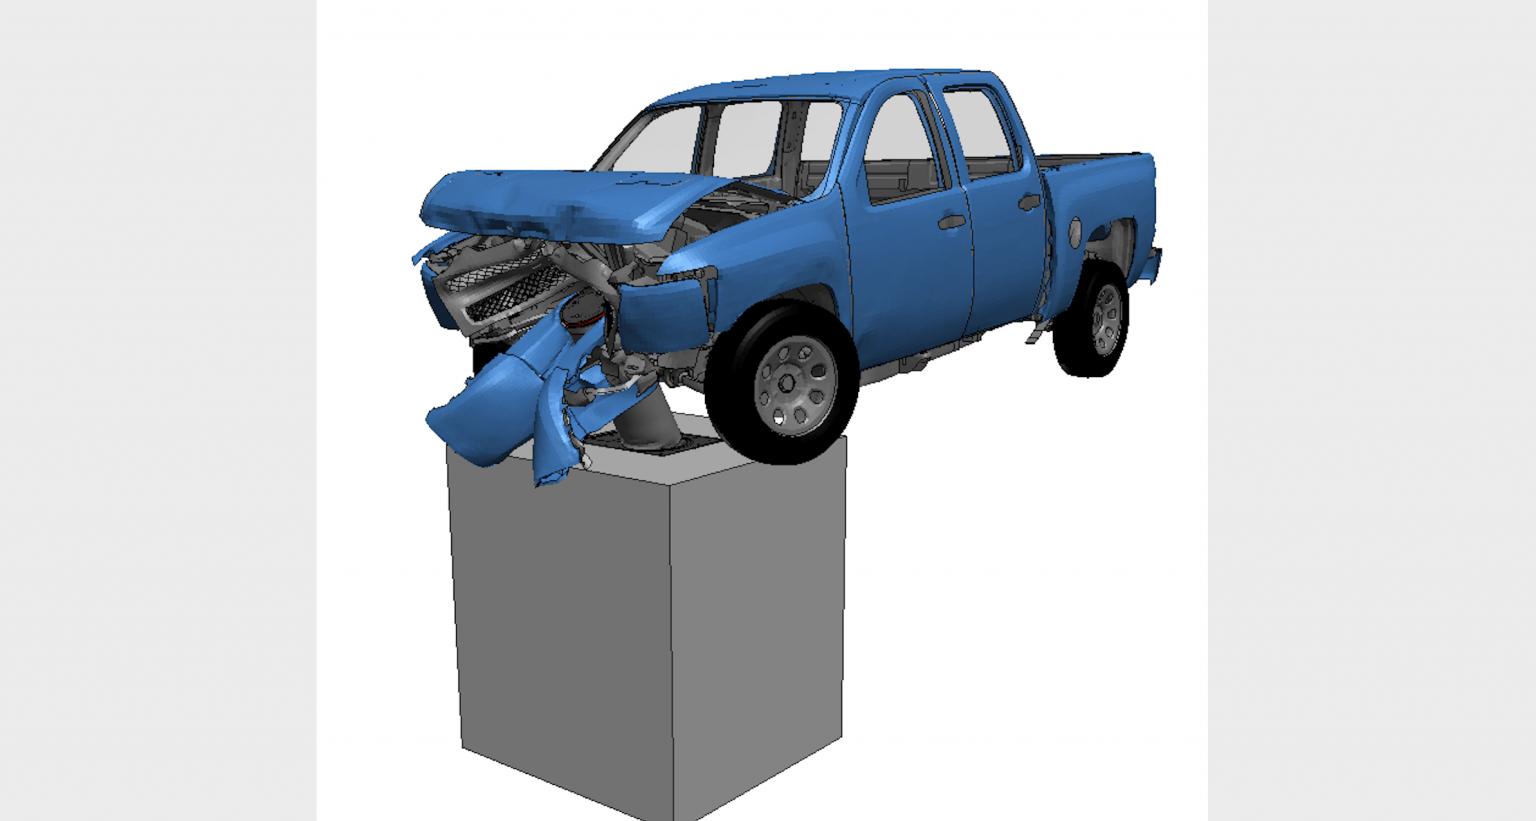 Impact of pick-up truck on bollard – IWA 14-1/2013 standard